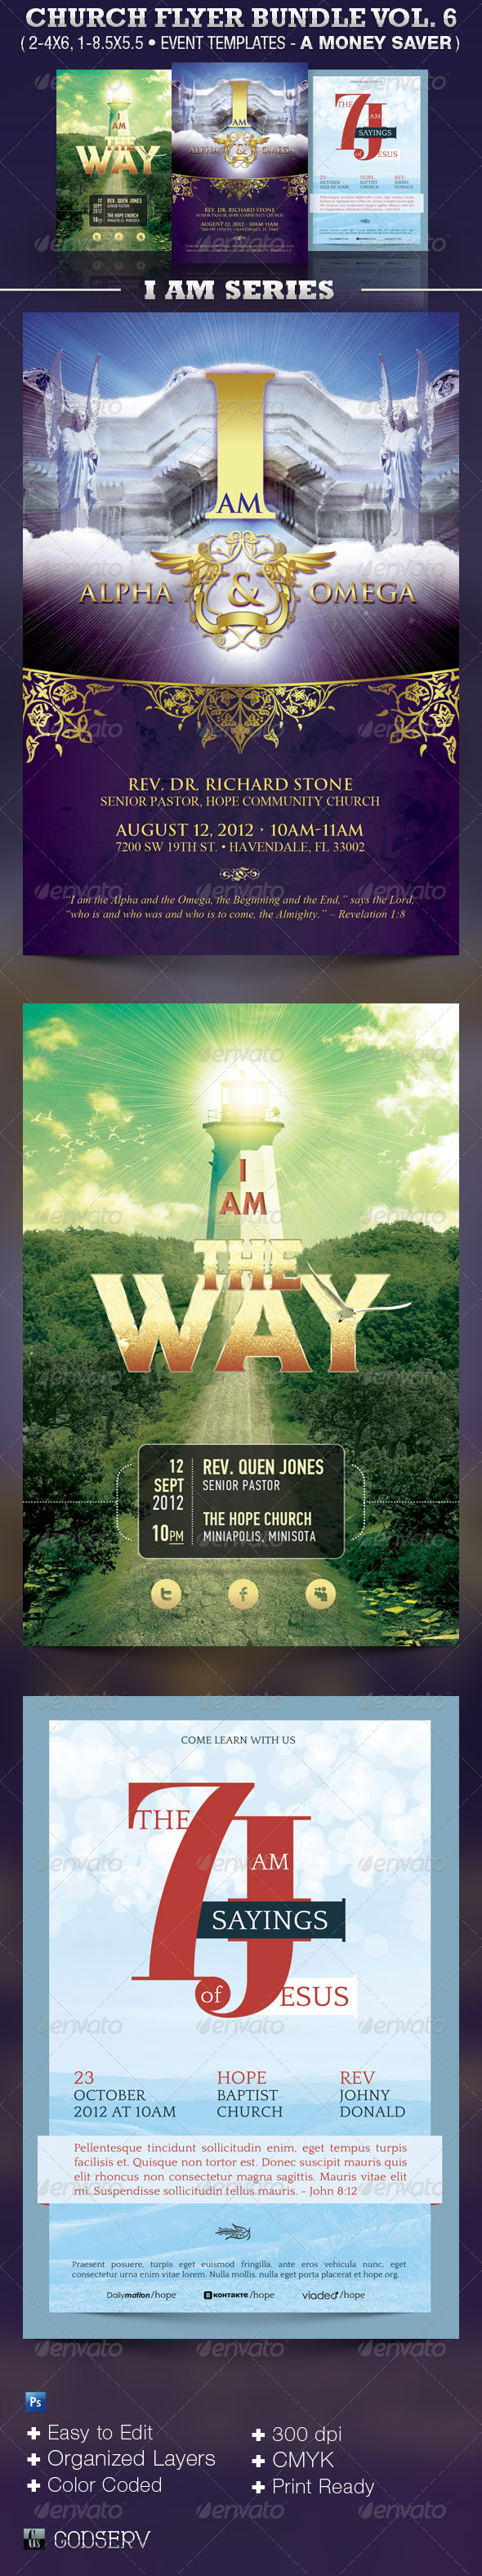 I Am Church Flyer Template Bundle Vol 6 - Church Flyers